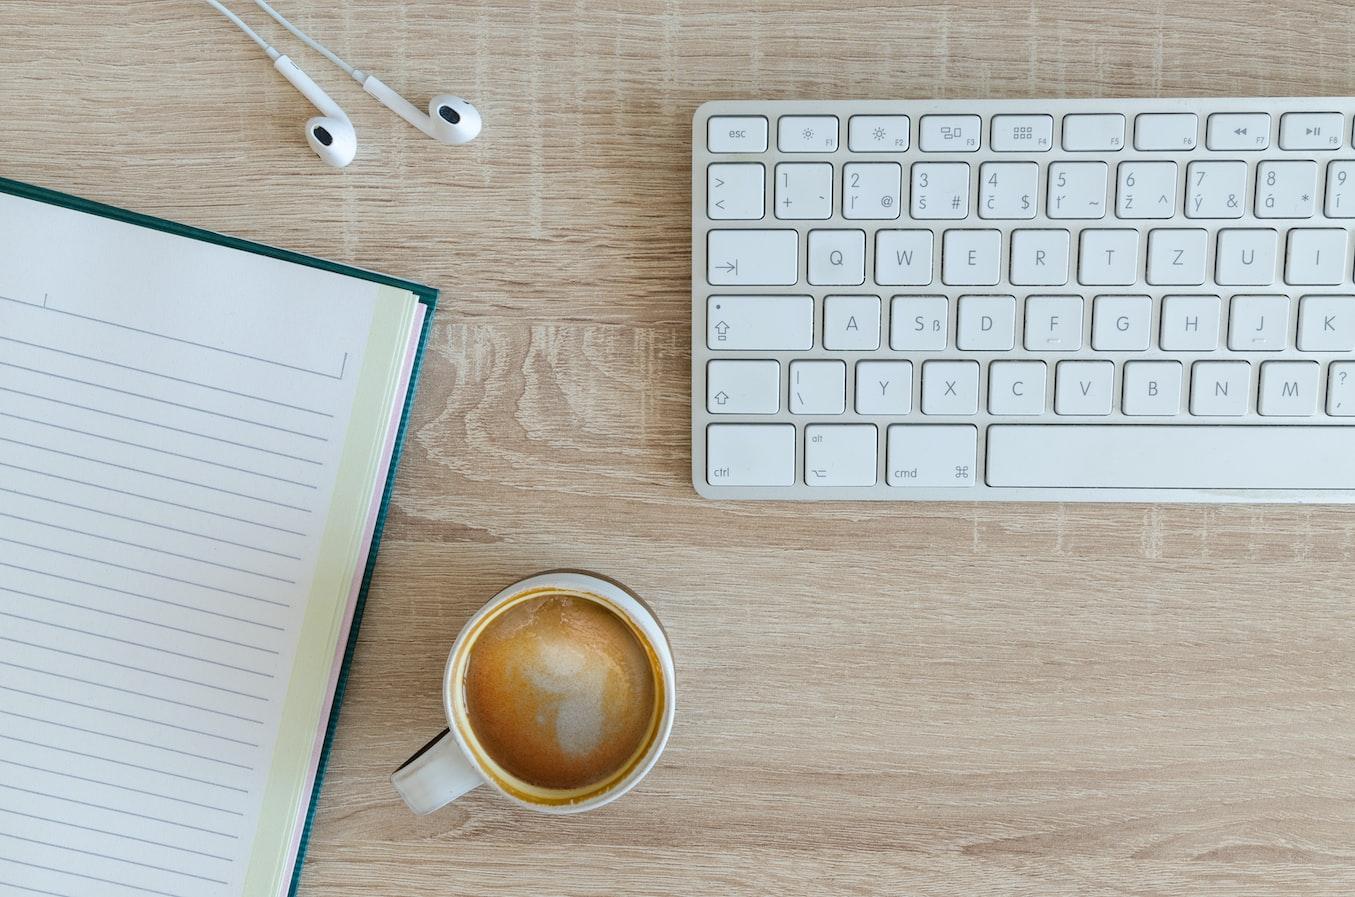 Stock image of a keyboard, earphones, notebook and a coffee mug.